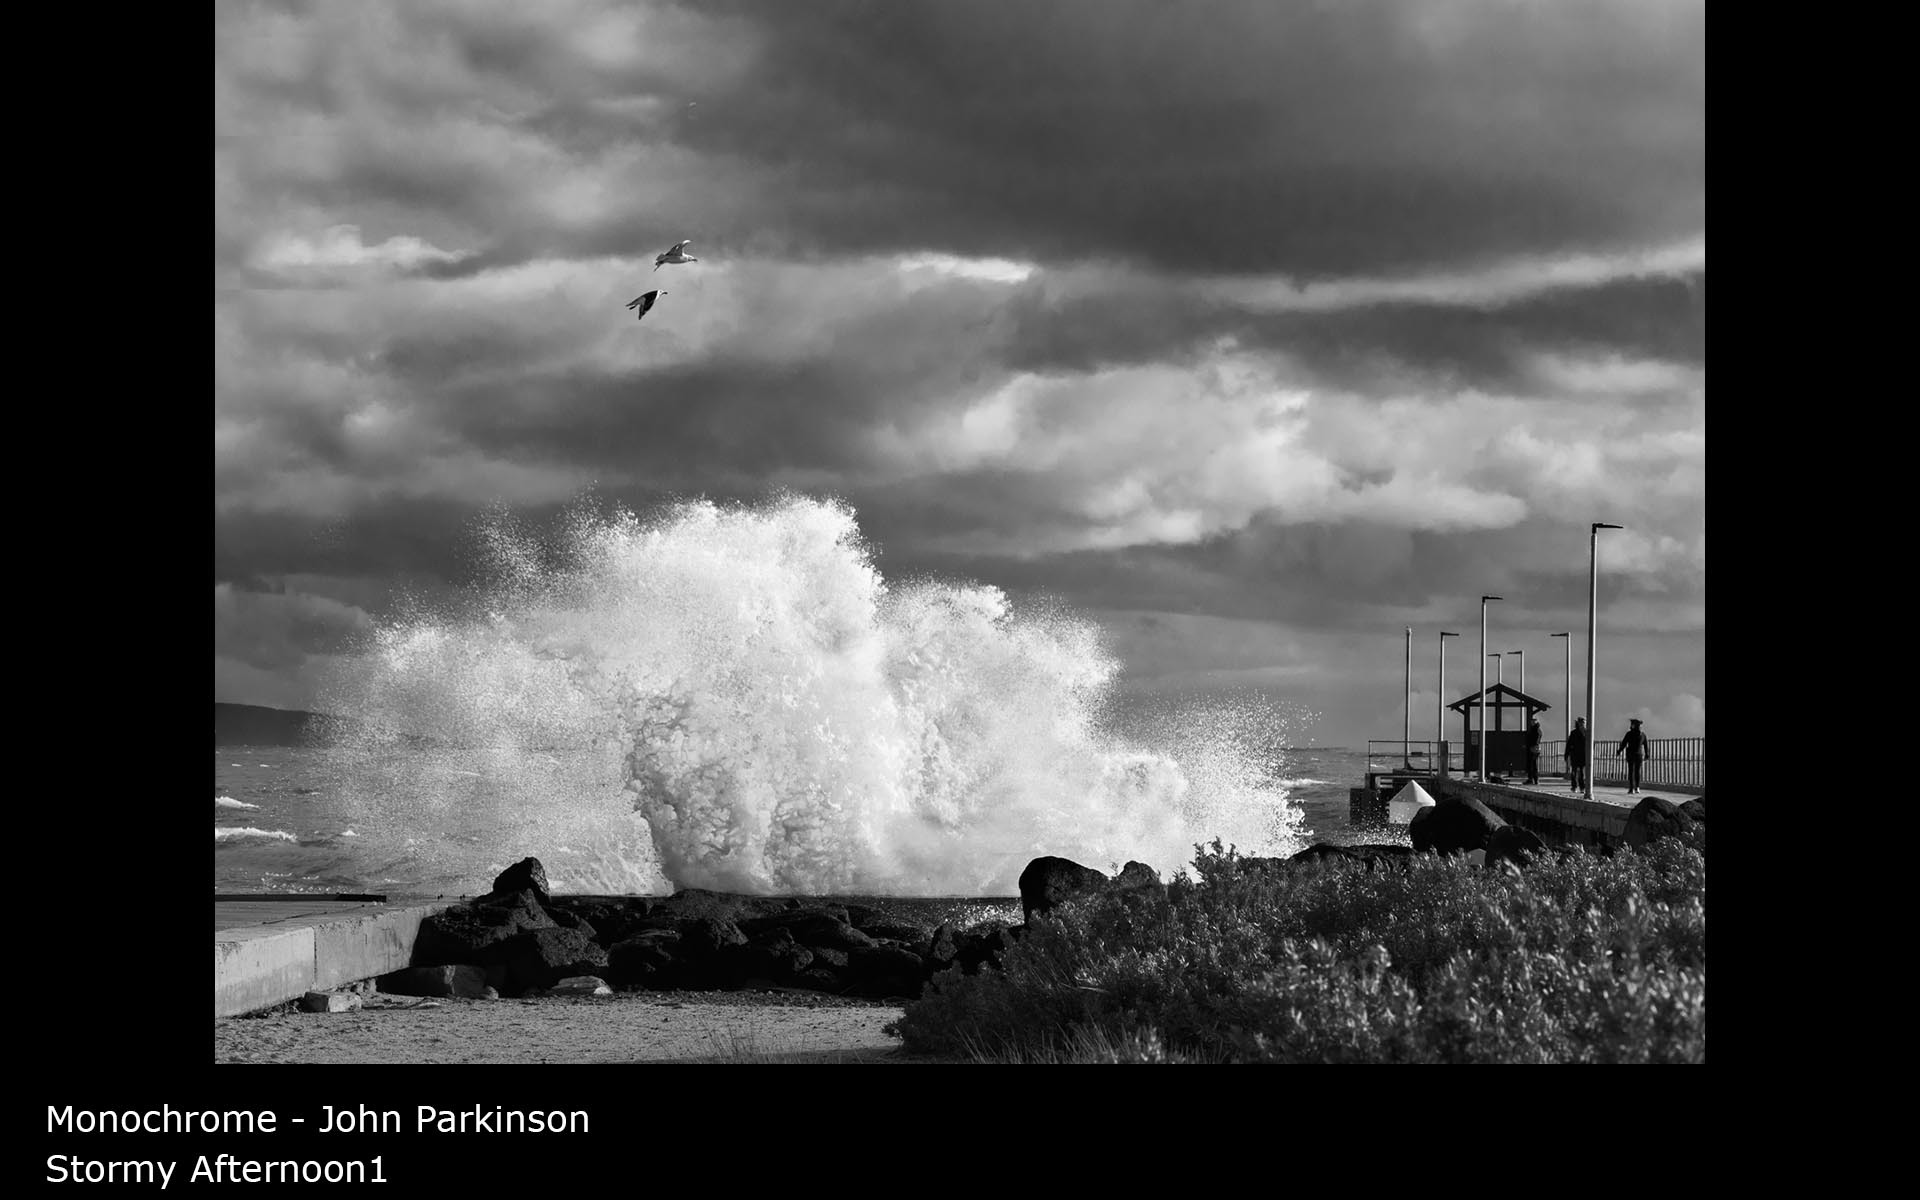 Stormy Afternoon1 - John Parkinson